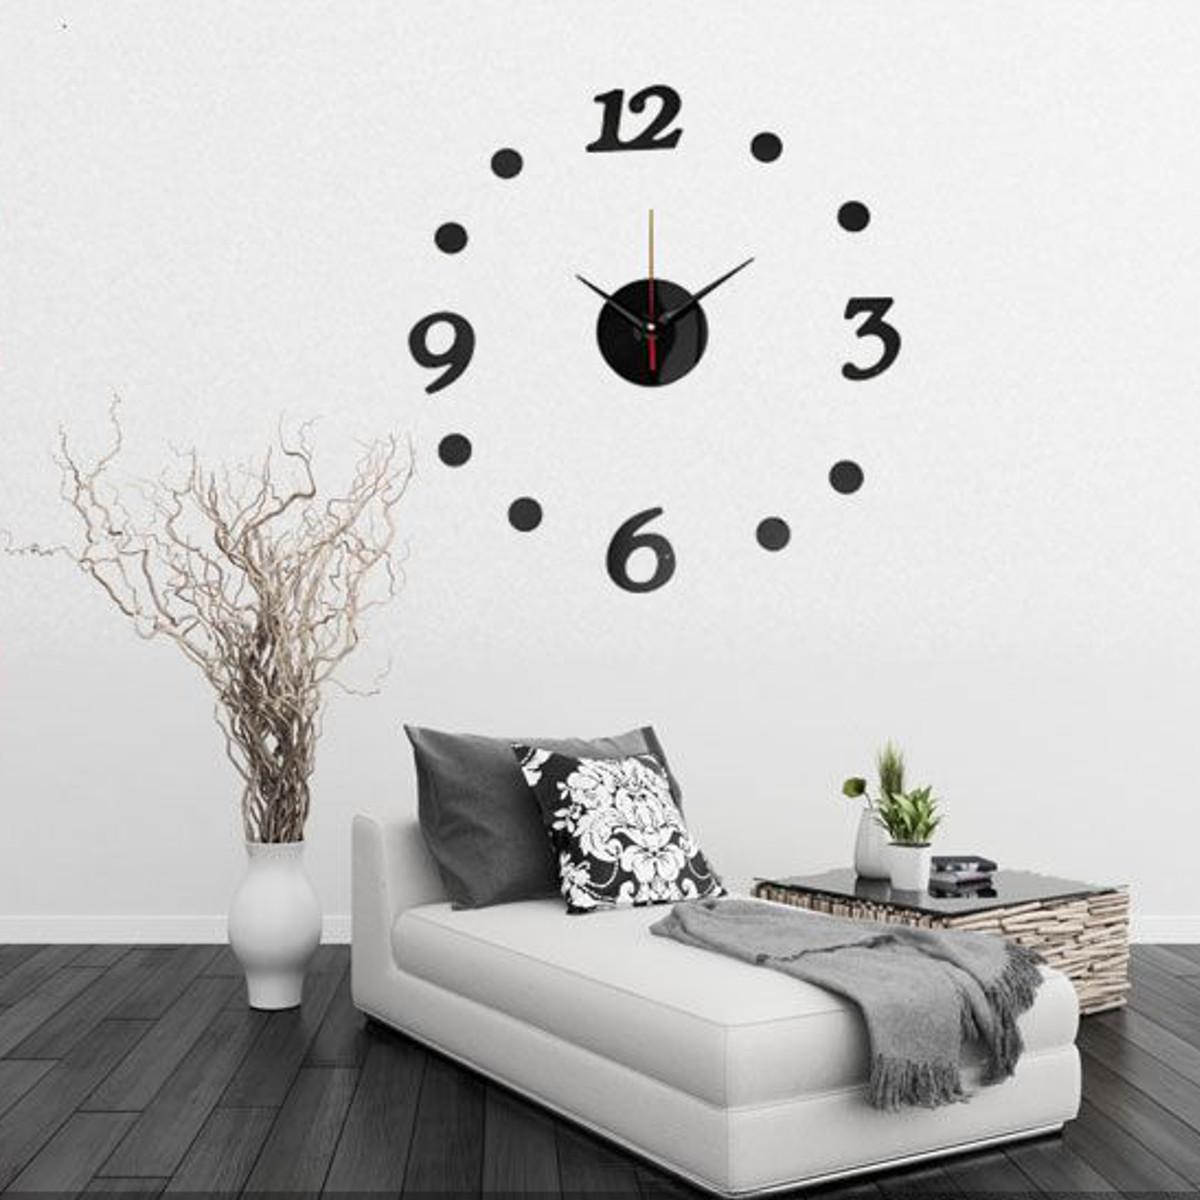 Maison > Horloges > Horloges murales